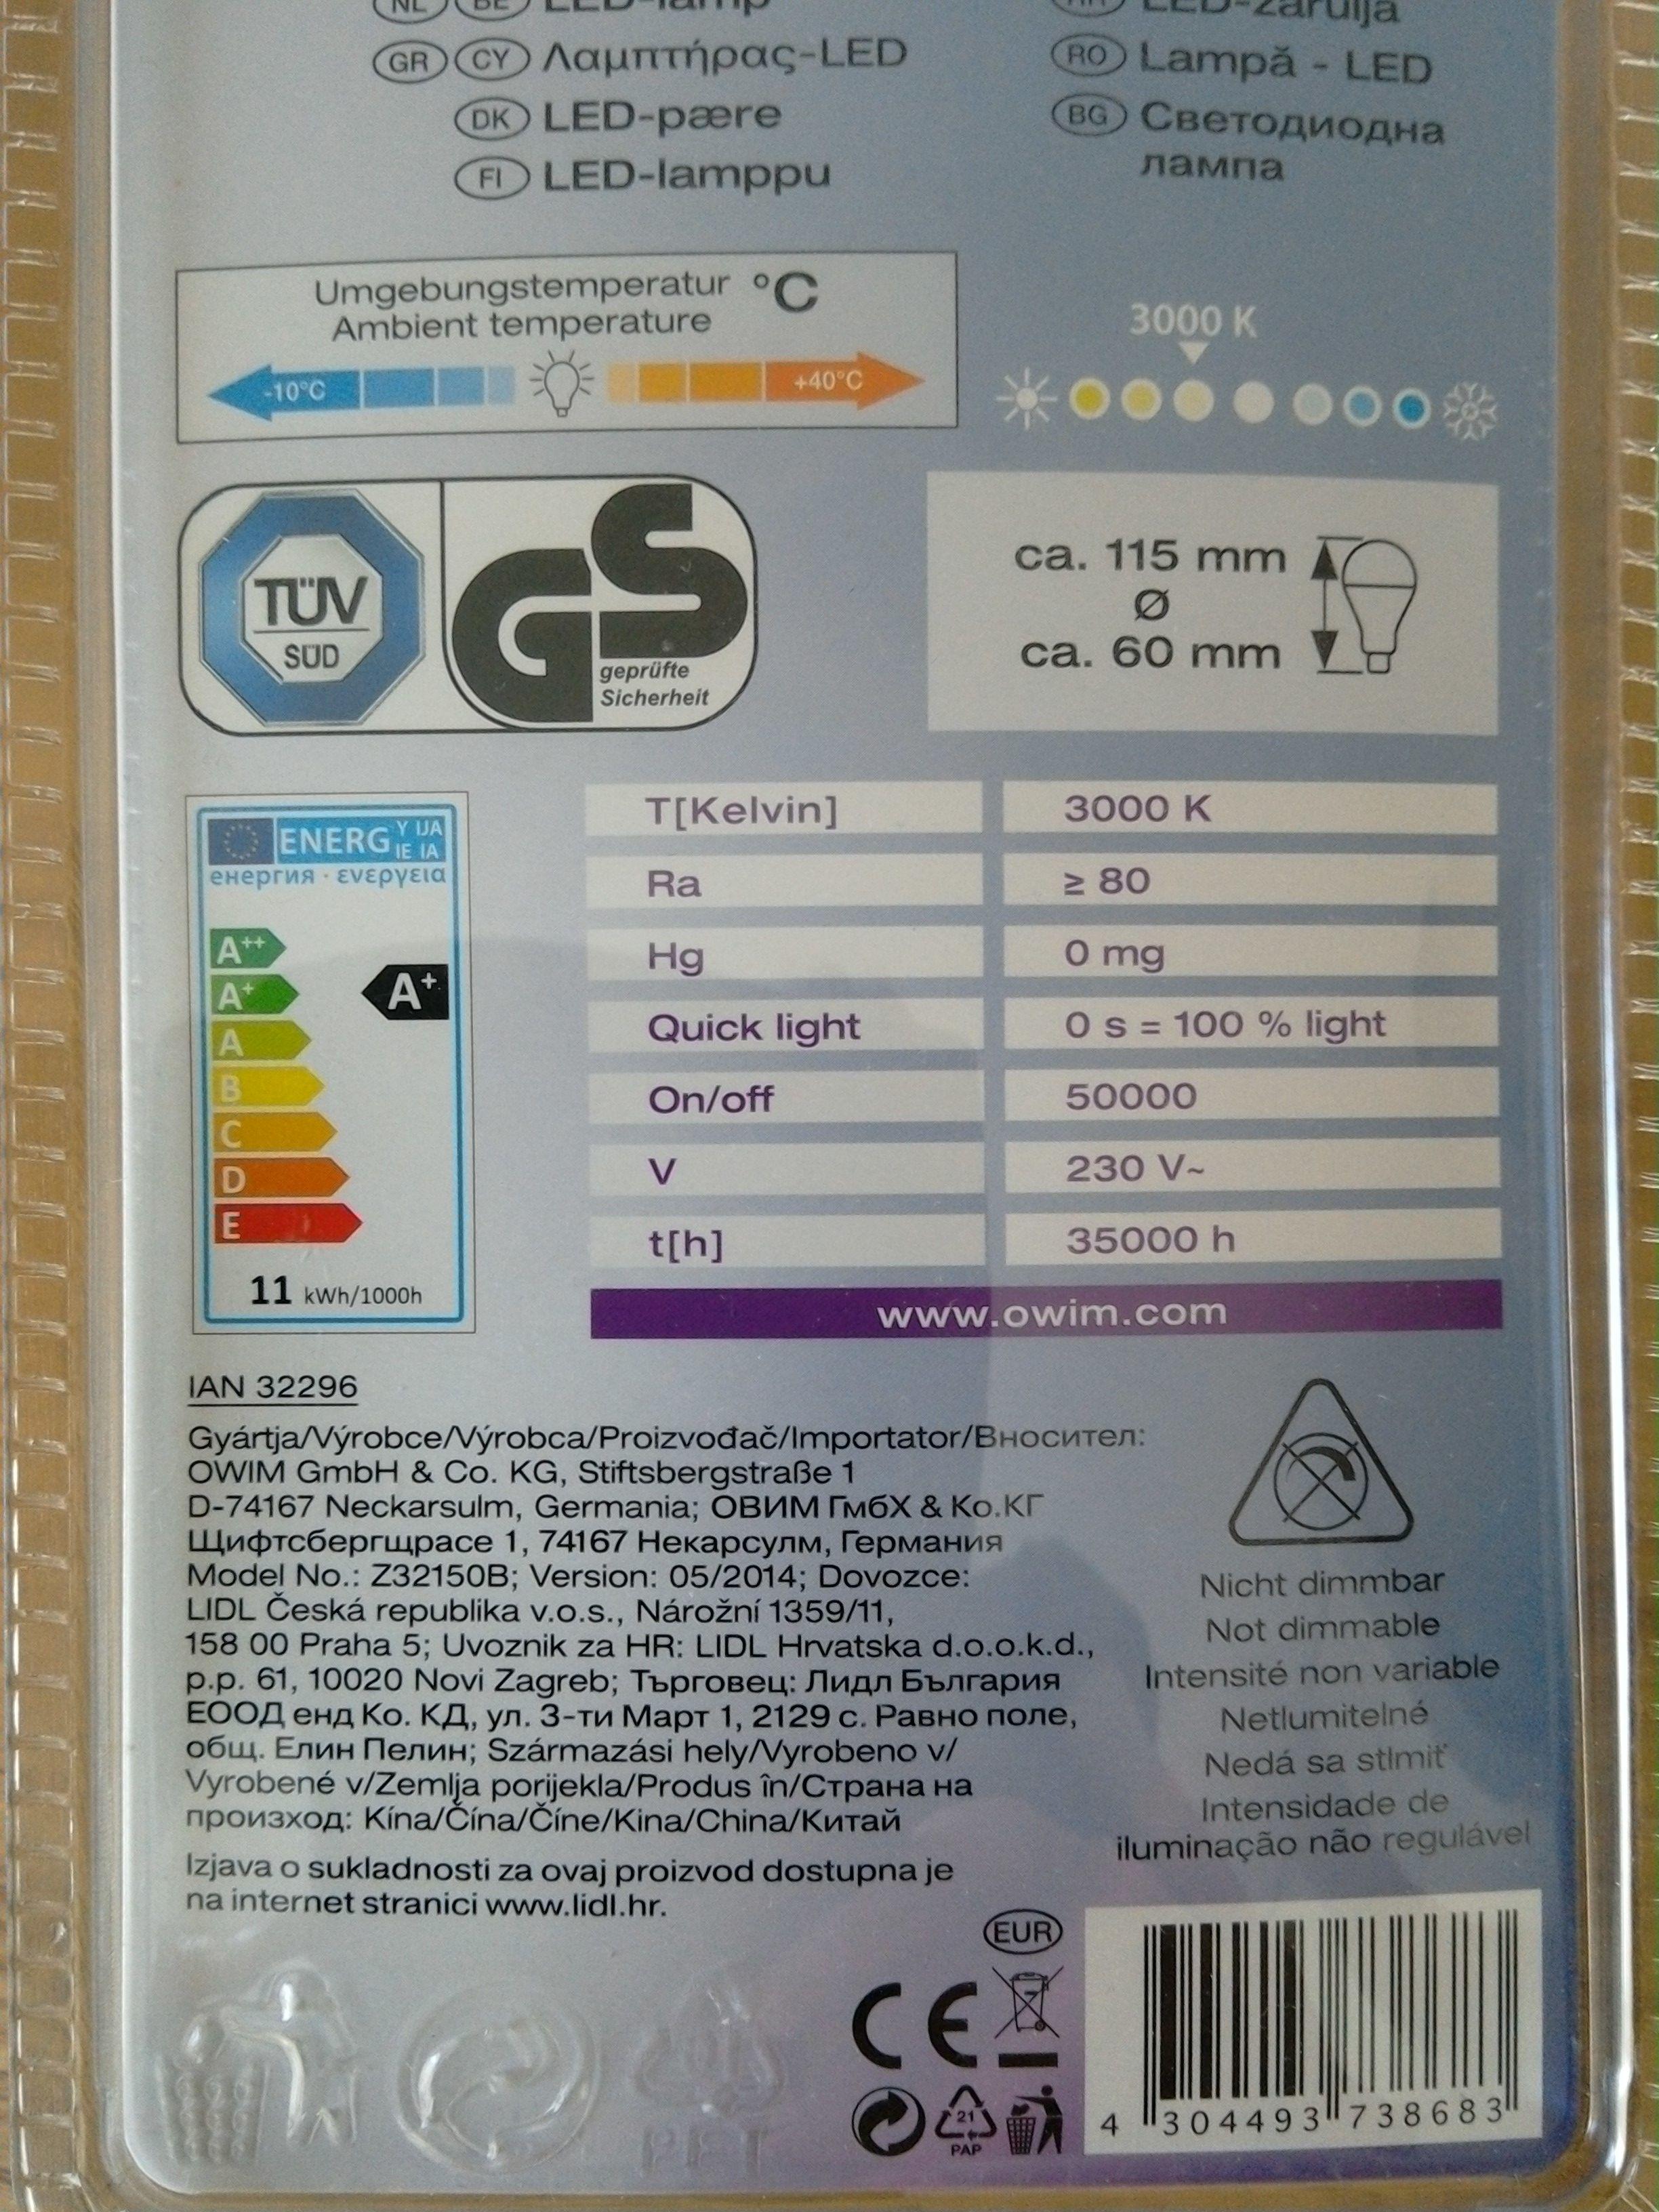 a2cda3311a77340fecf62fee947c9cd2 Fabelhafte Led Lampen E27 Test Dekorationen